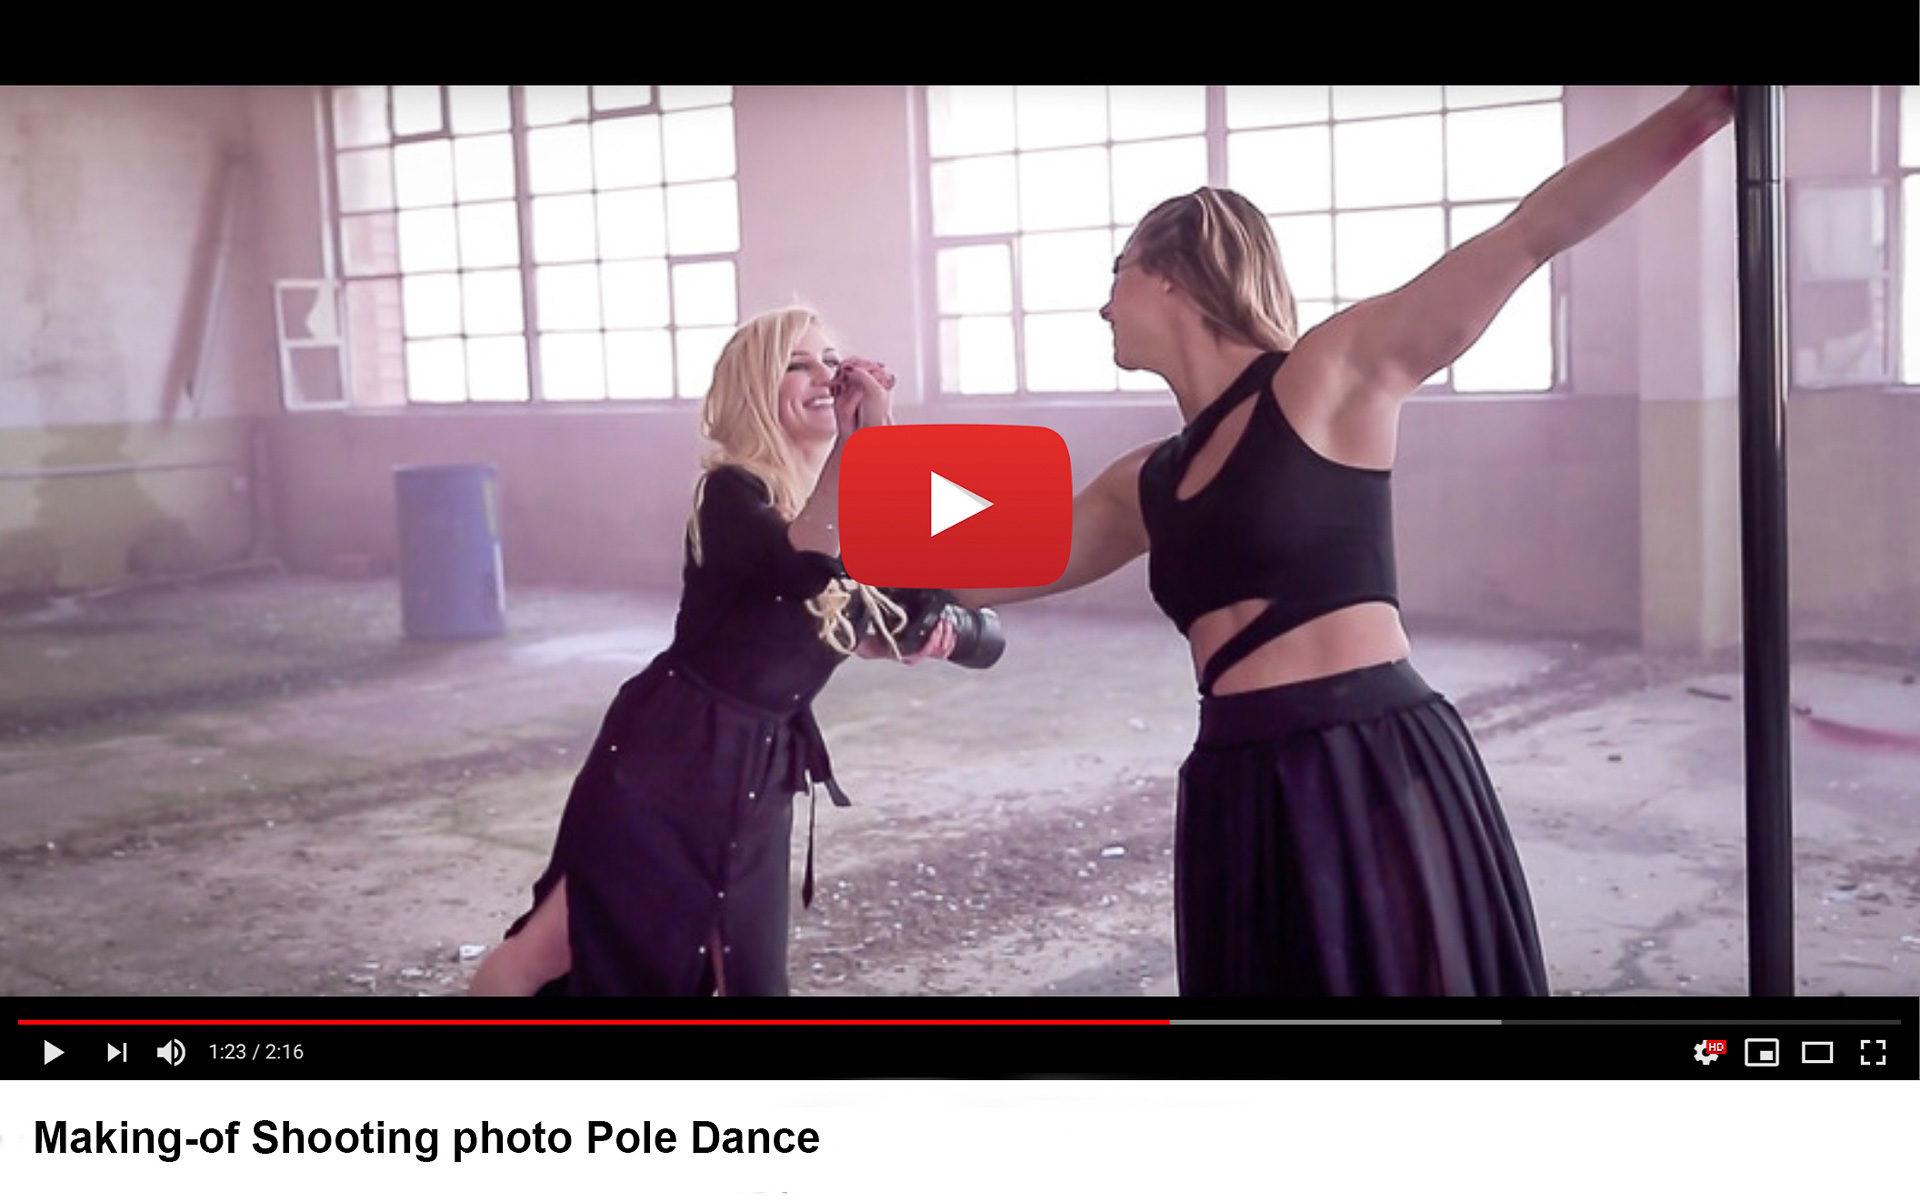 youtube making-of pole dance - Valentine Poulain